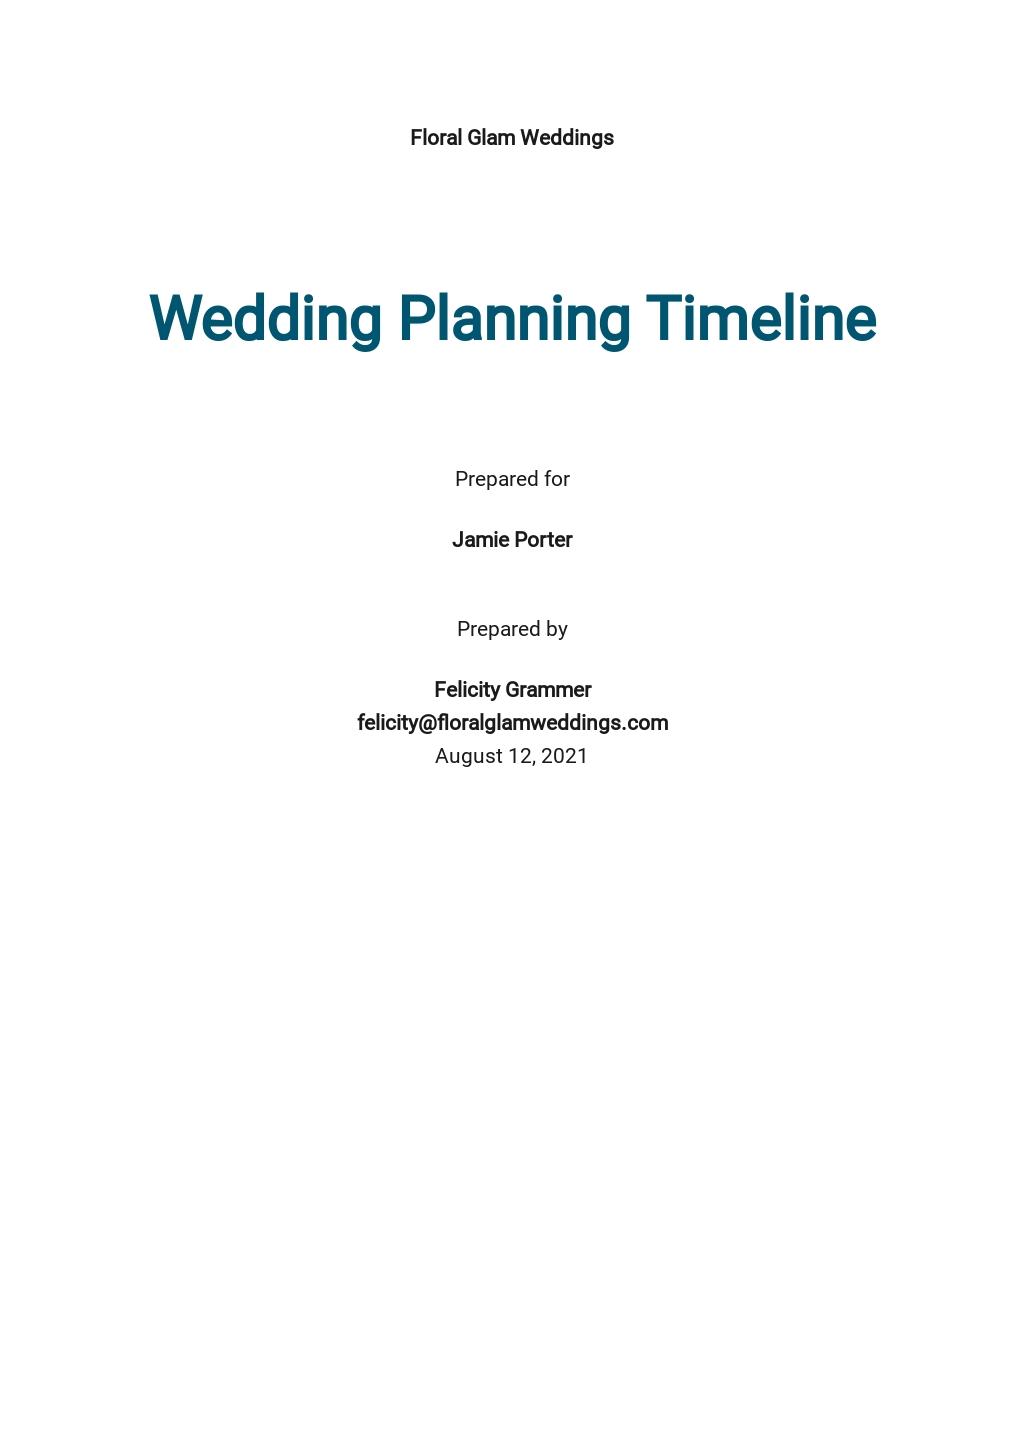 Wedding Planning Timeline Template.jpe